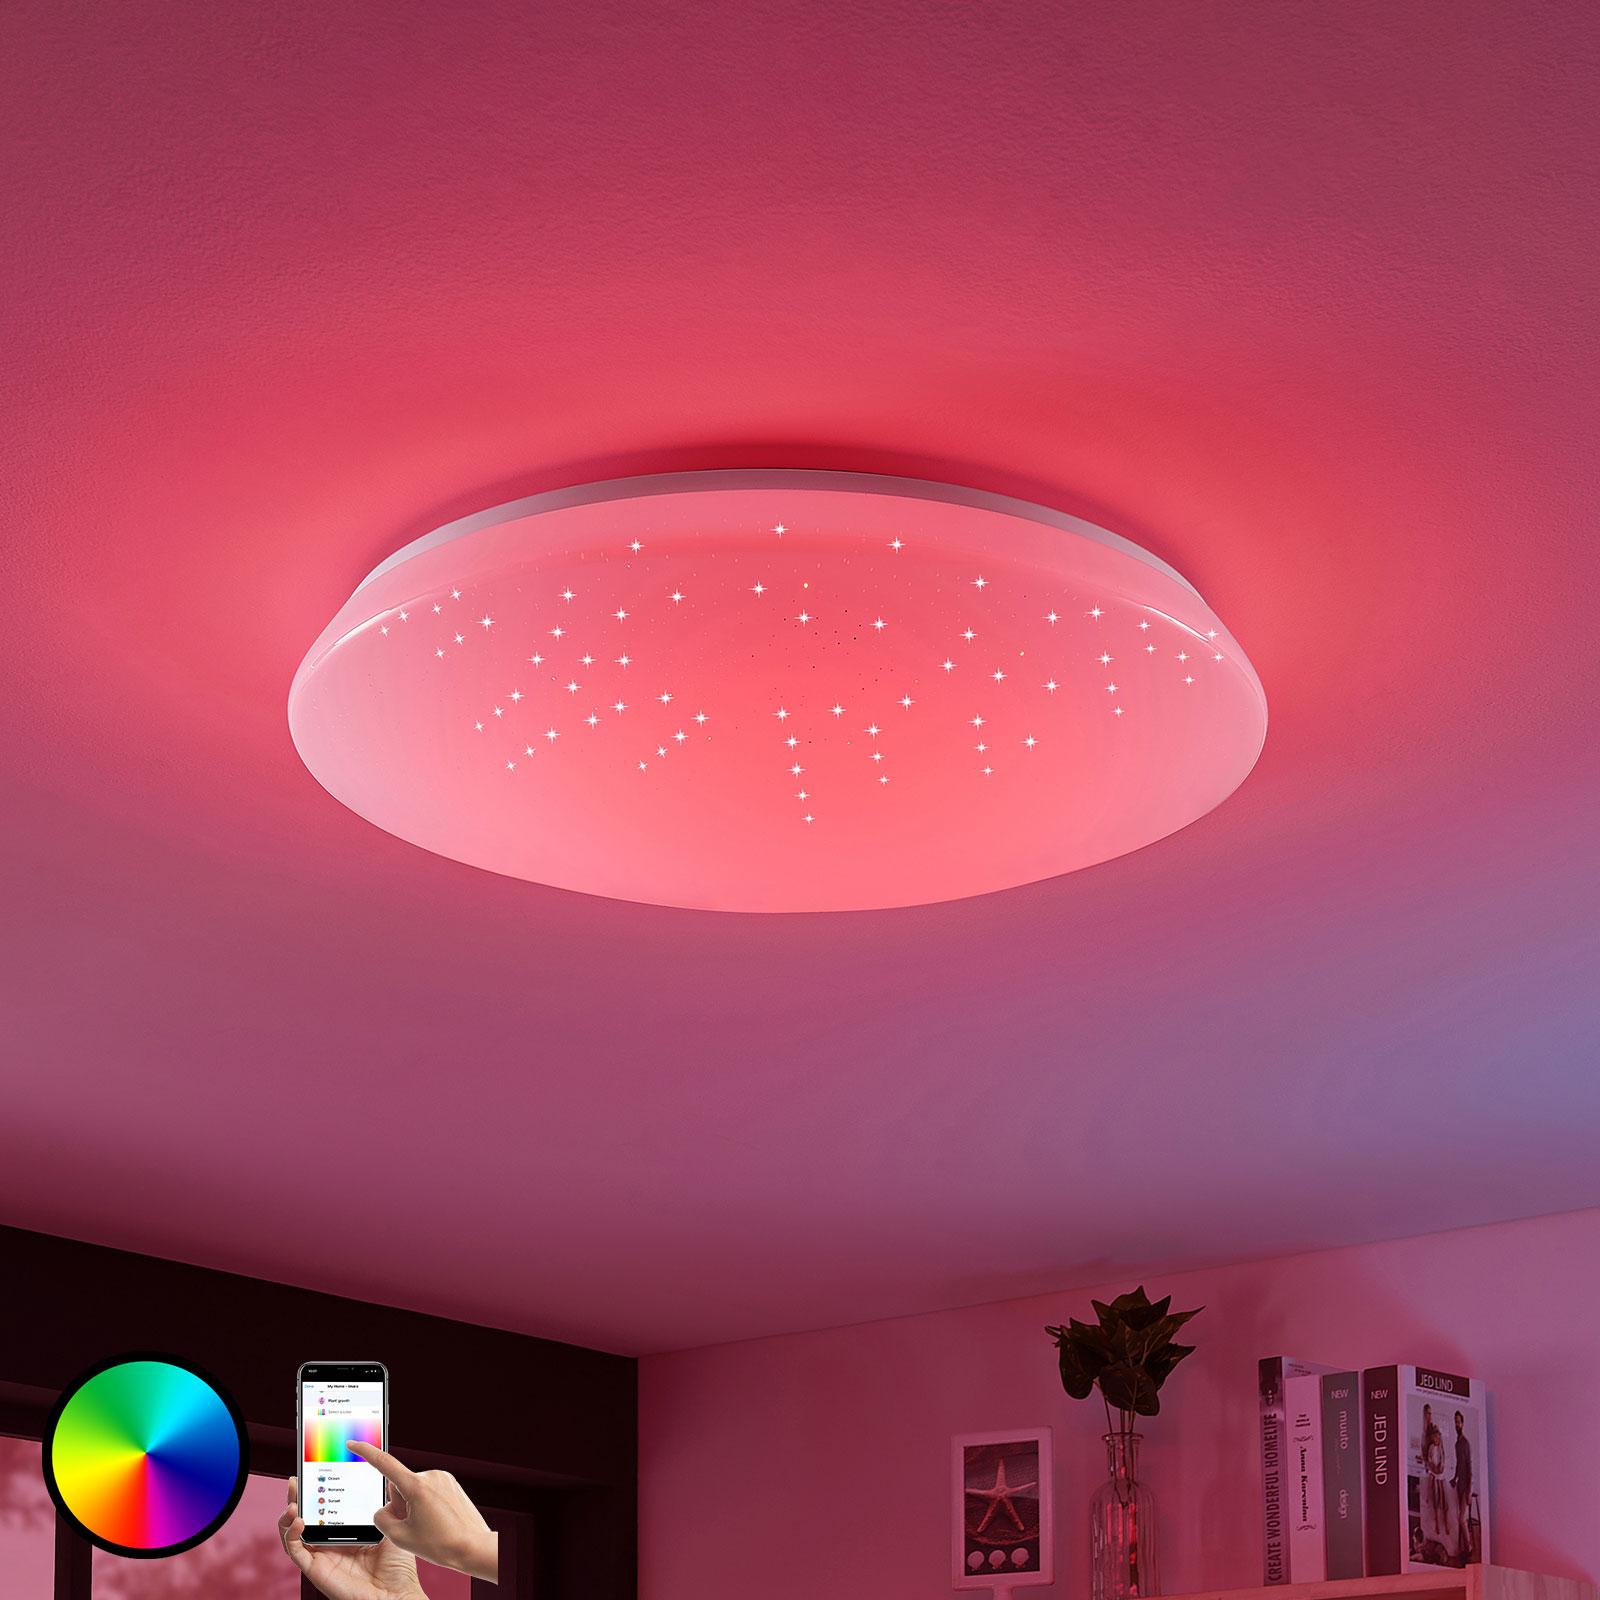 LED-loftlampe Jelka, WiZ, RGB-farveskift, rund